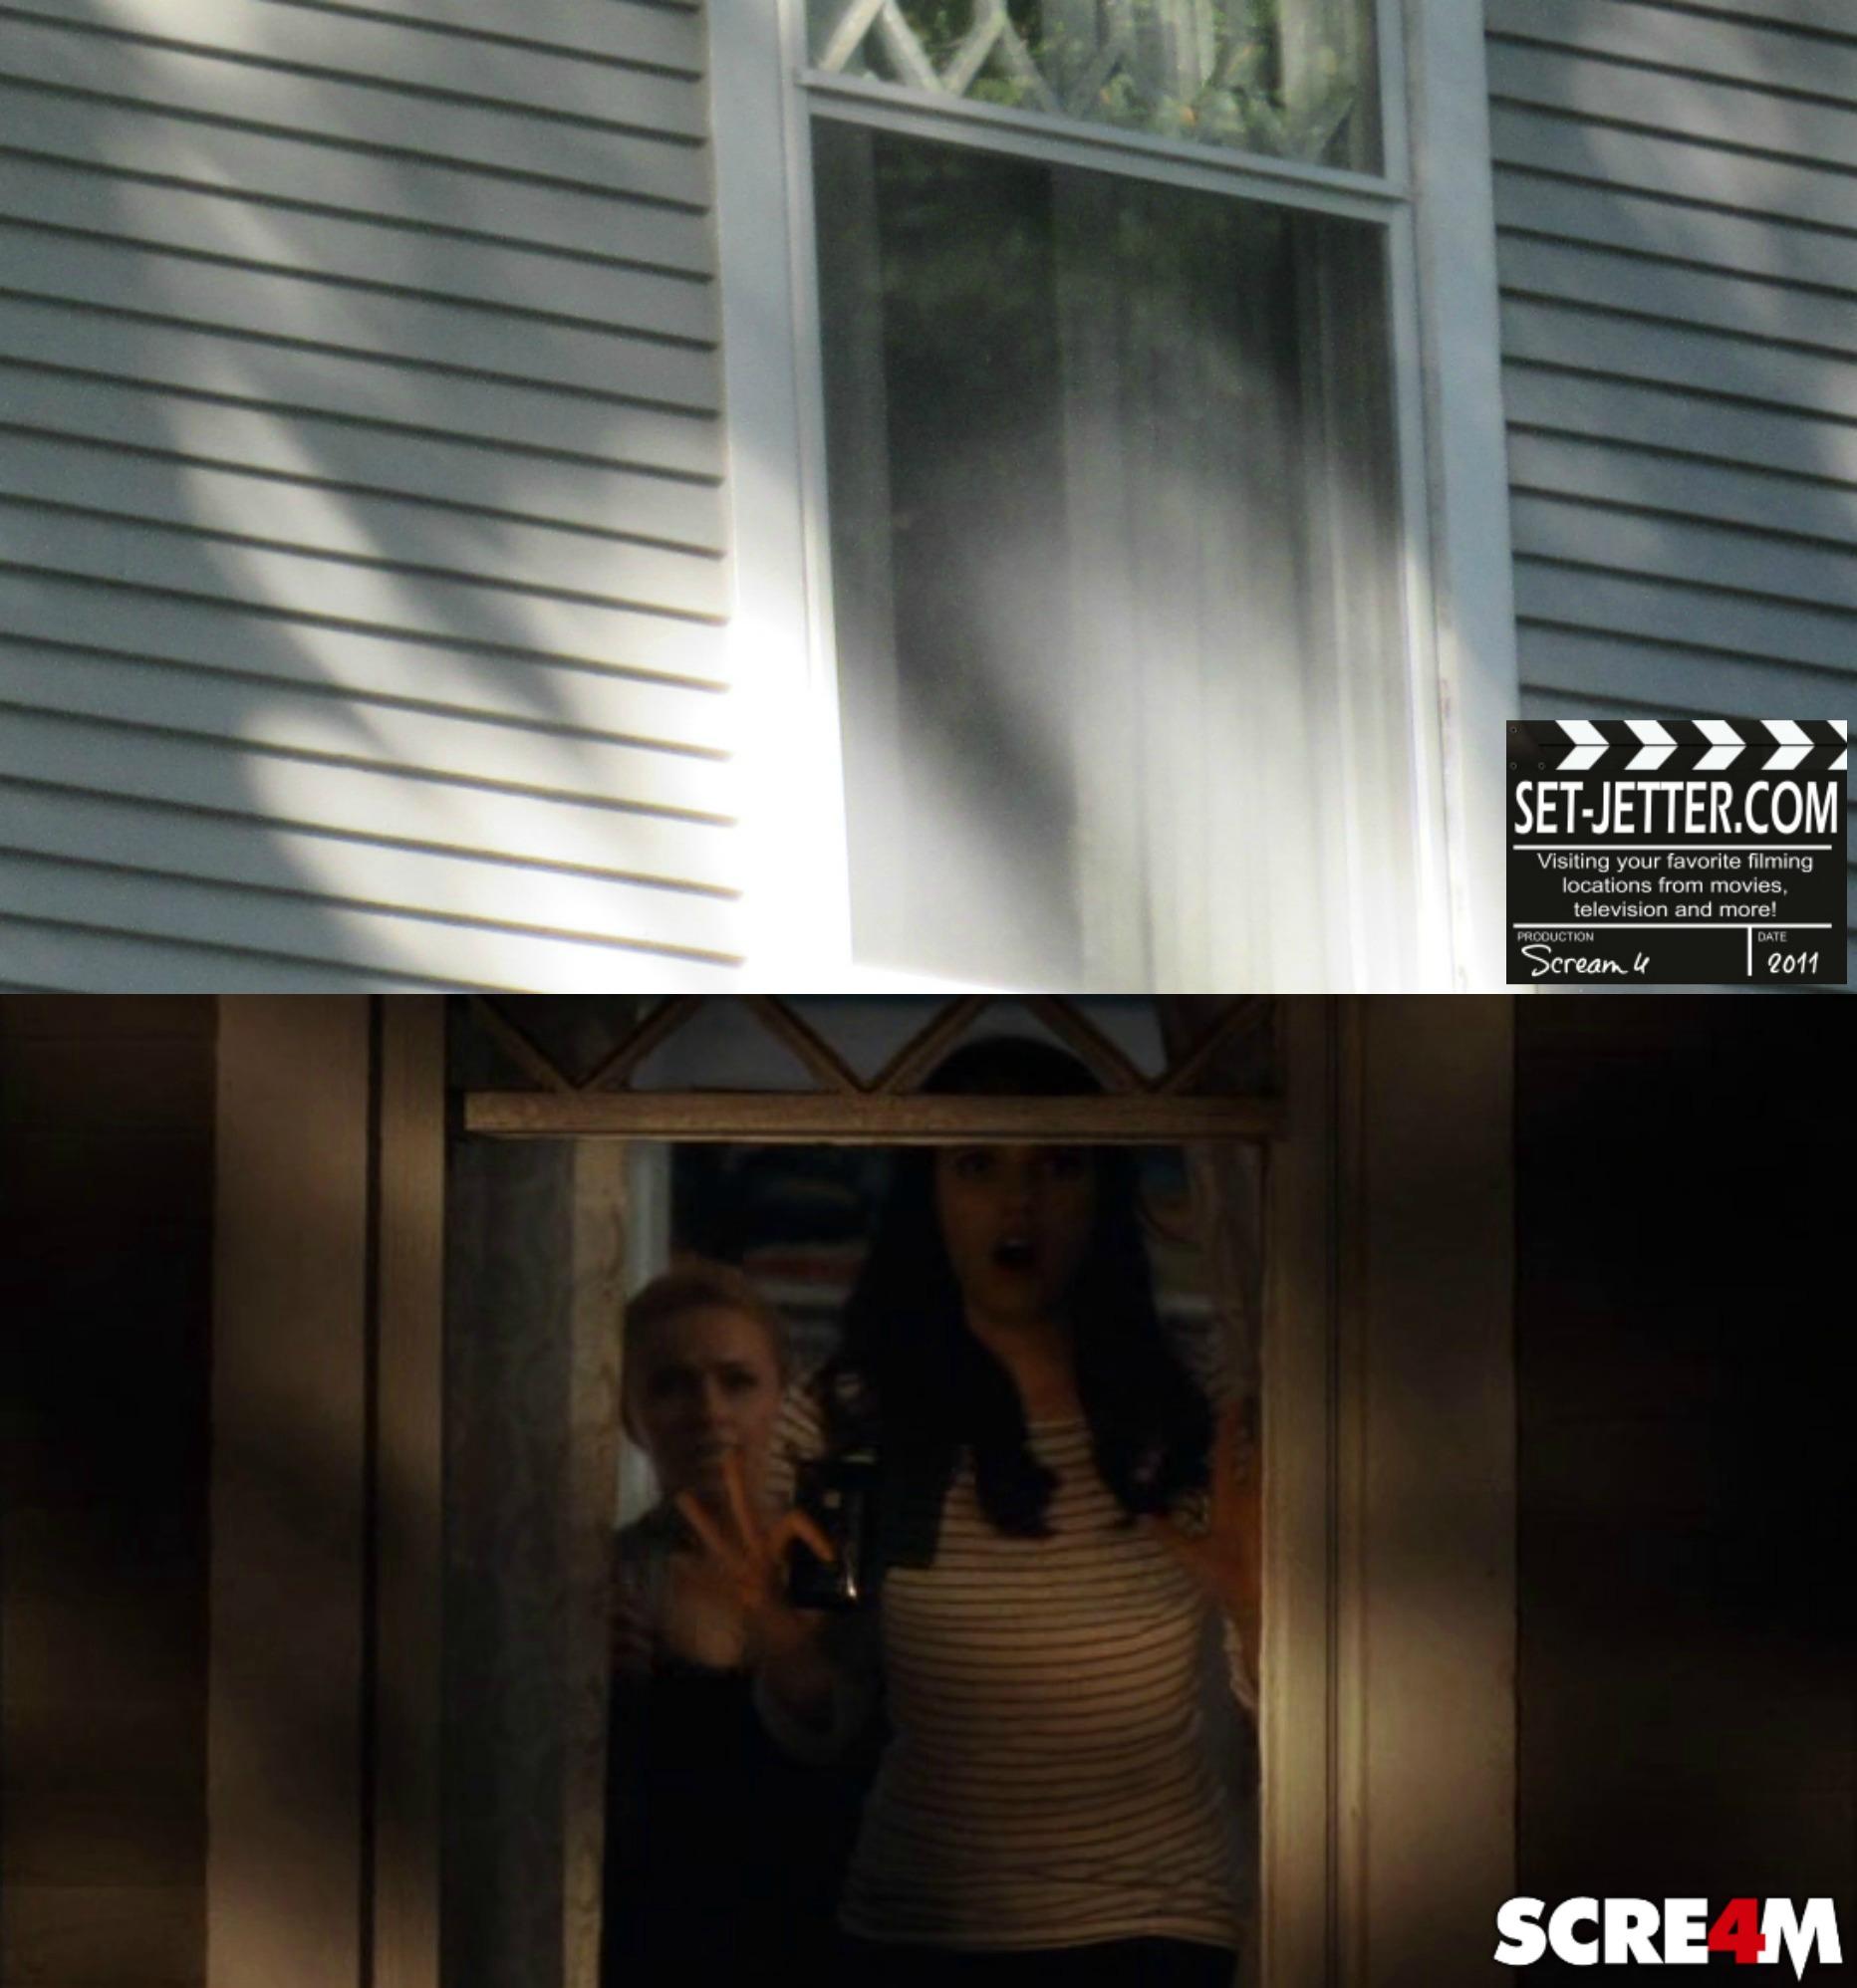 Scream4 comparison 113.jpg